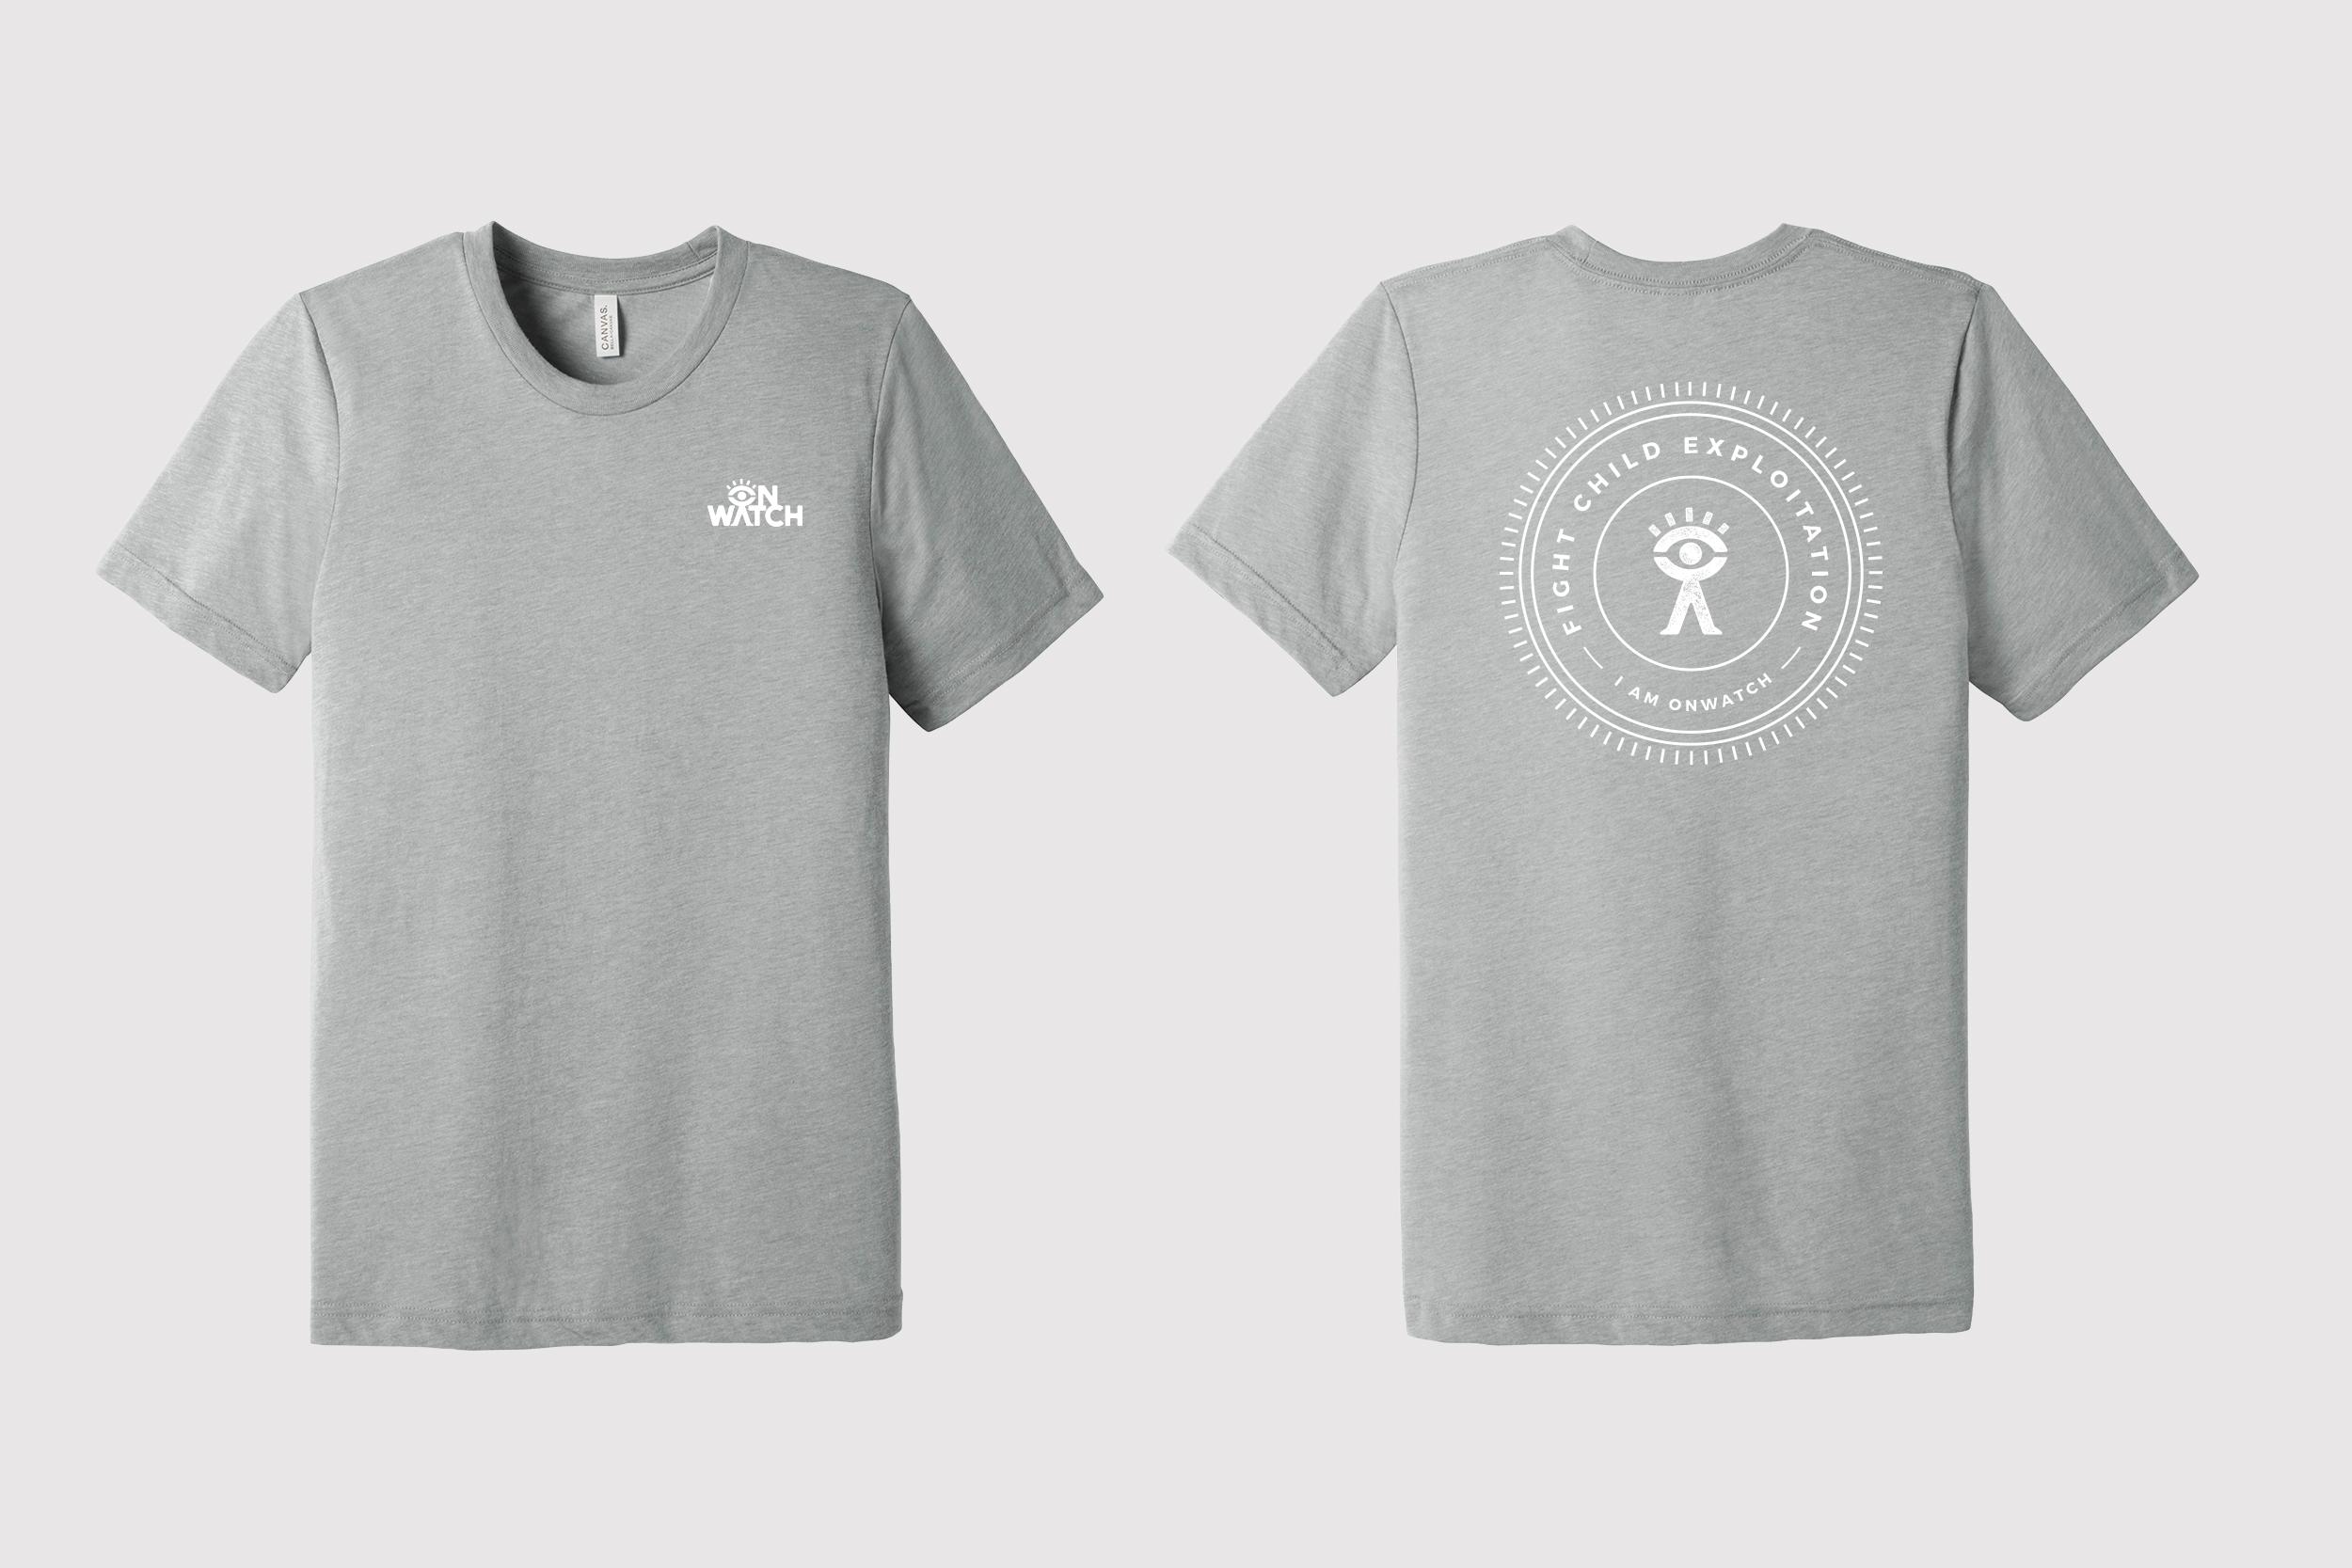 OnwatchBadge_shirt_gray.jpg